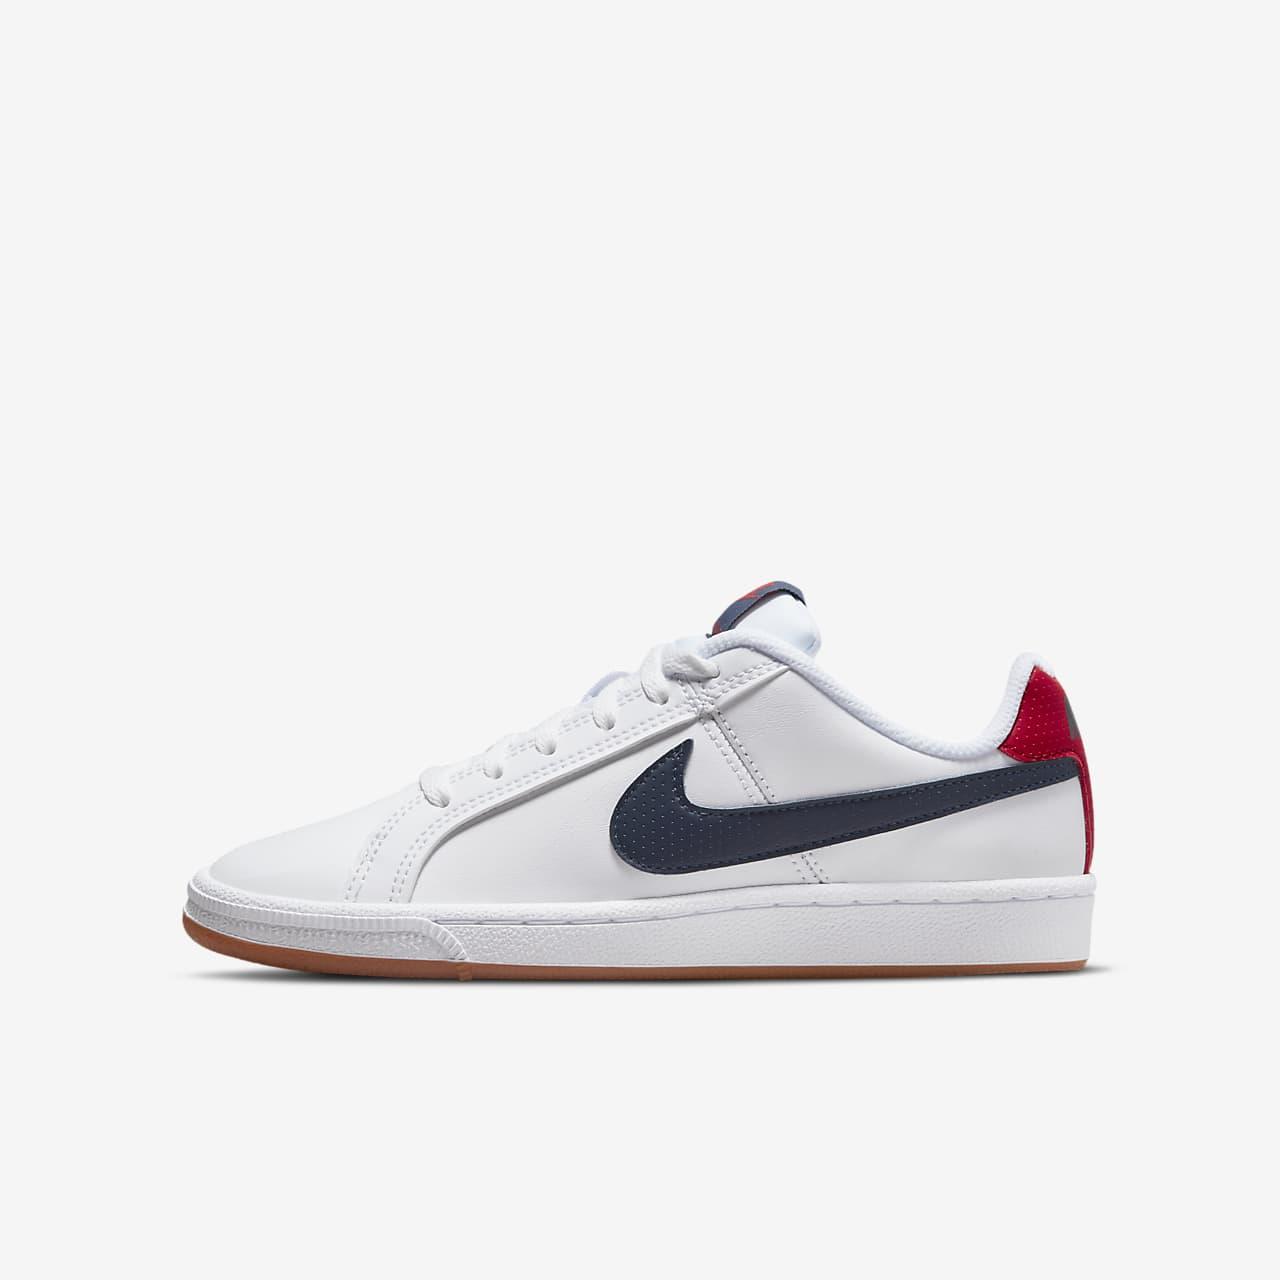 Sko NikeCourt Royale för ungdom